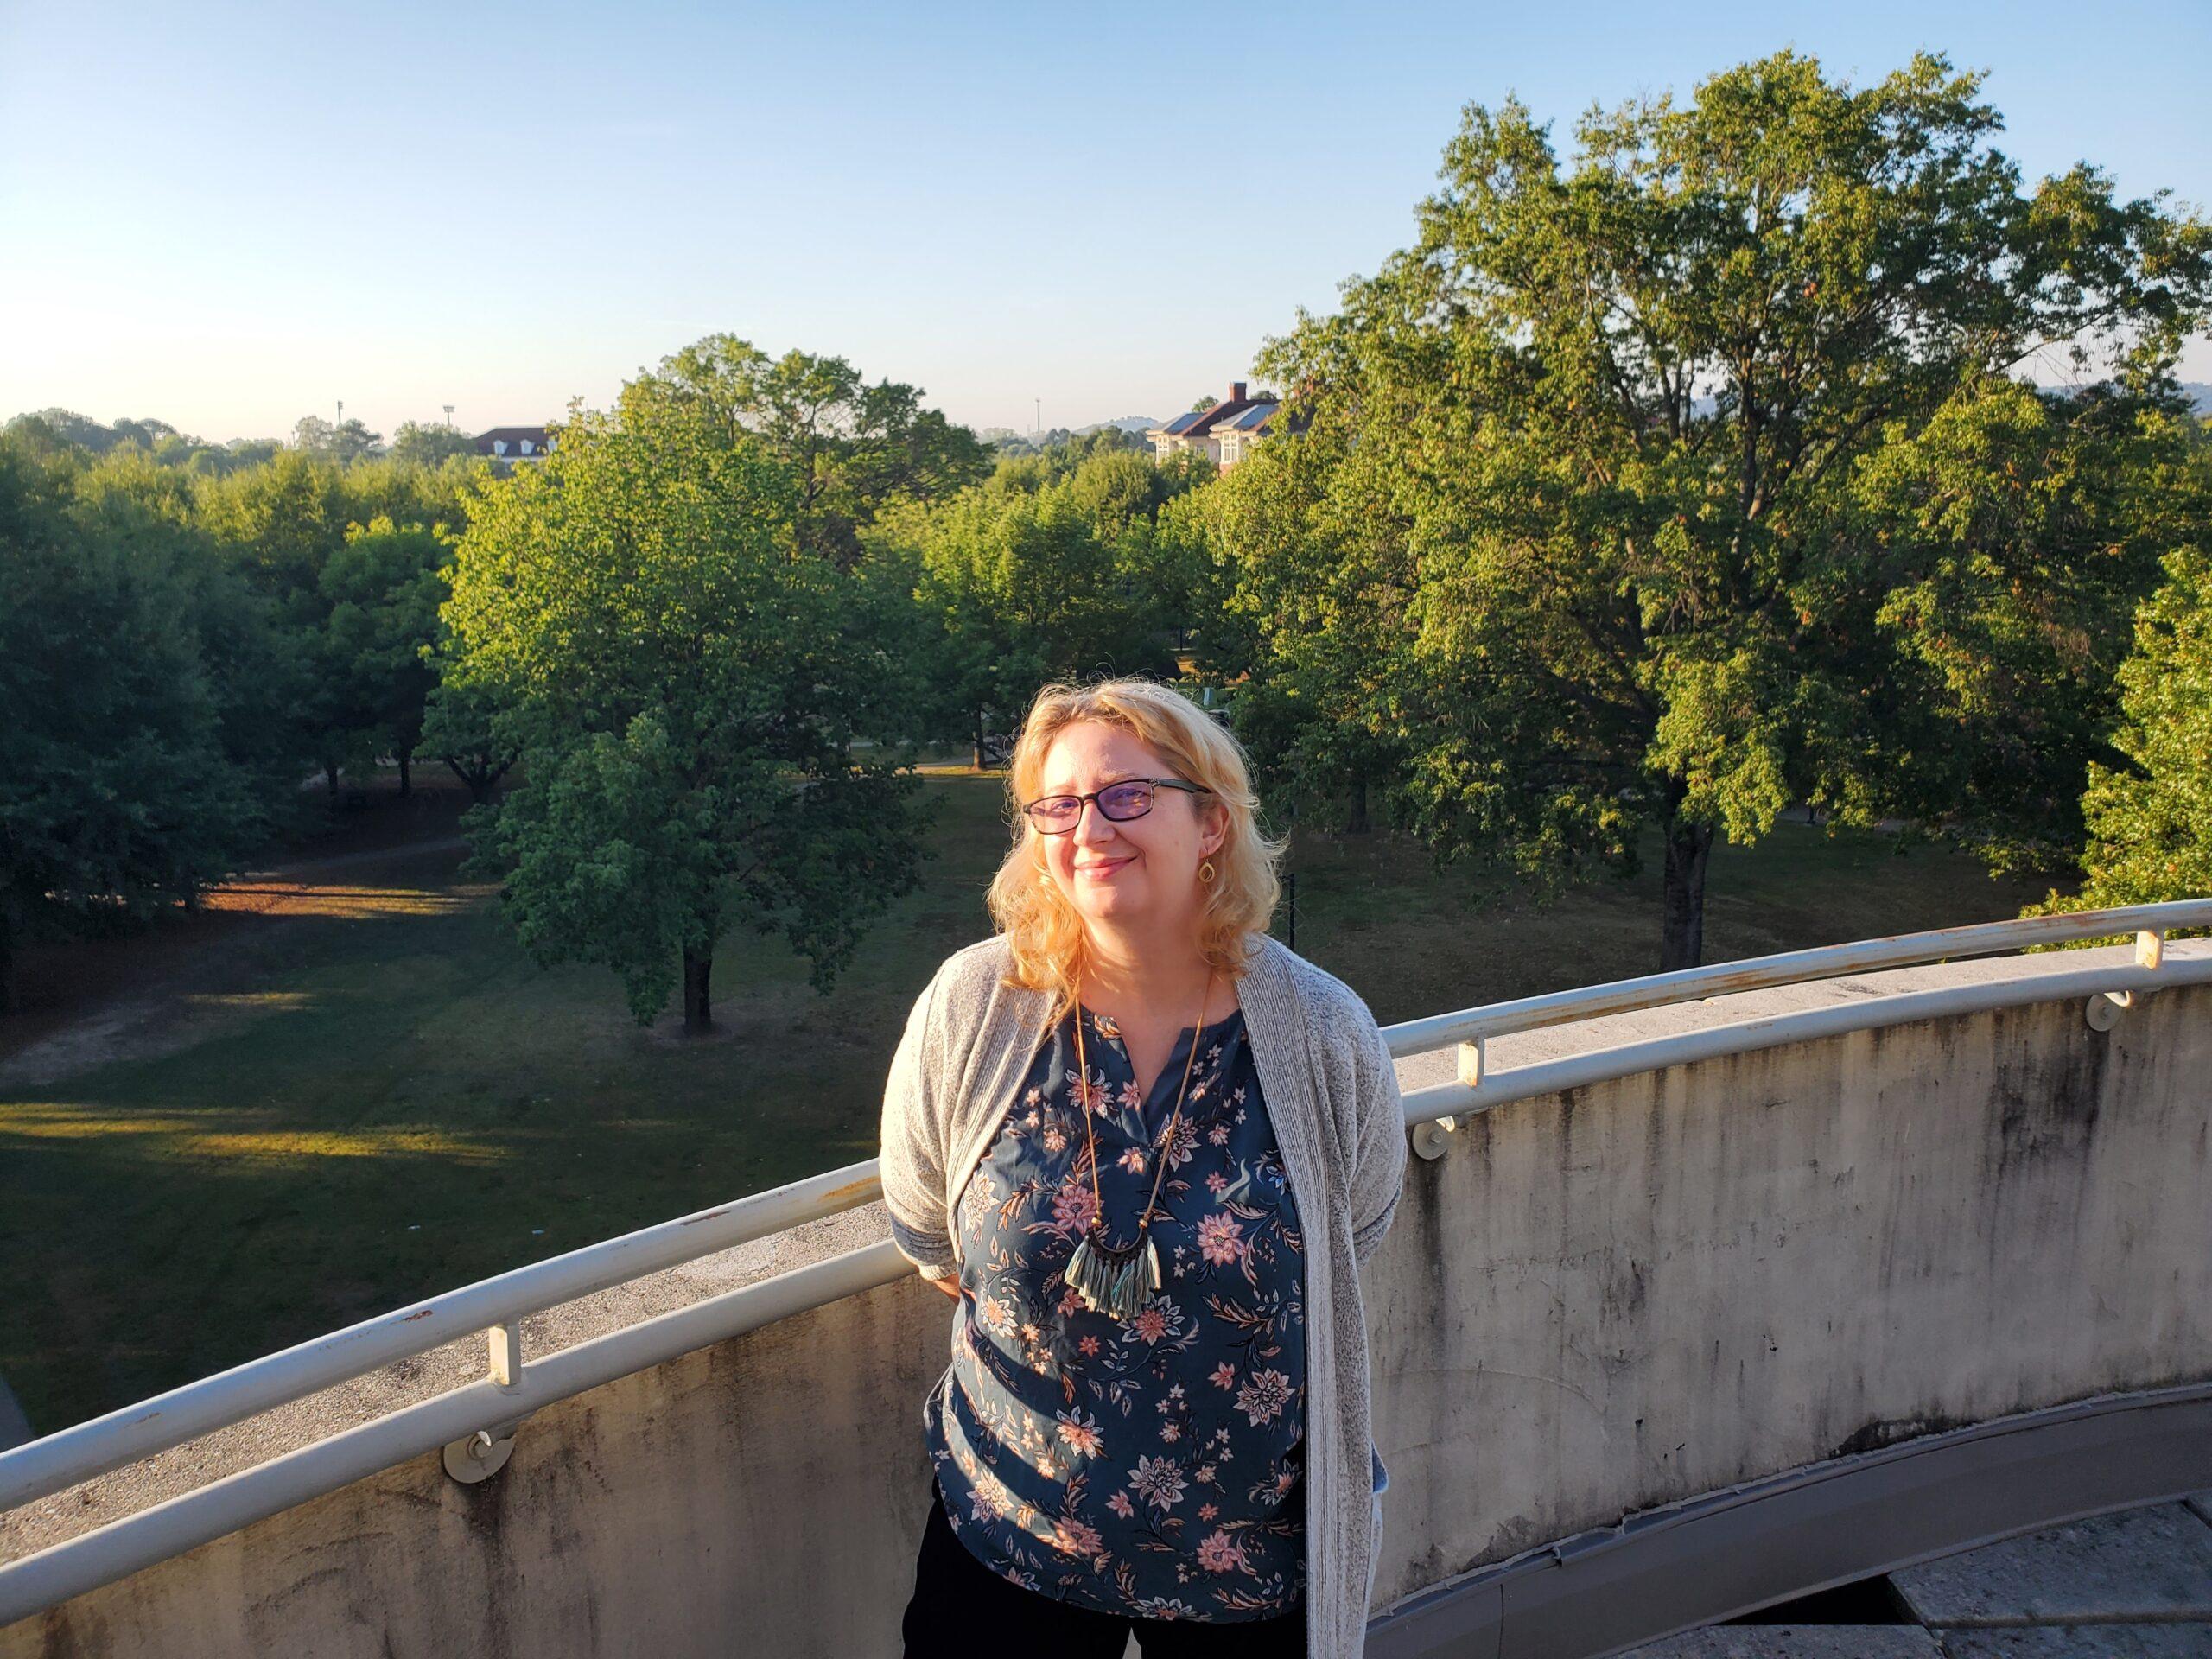 Angela Black, Technical Service Librarian